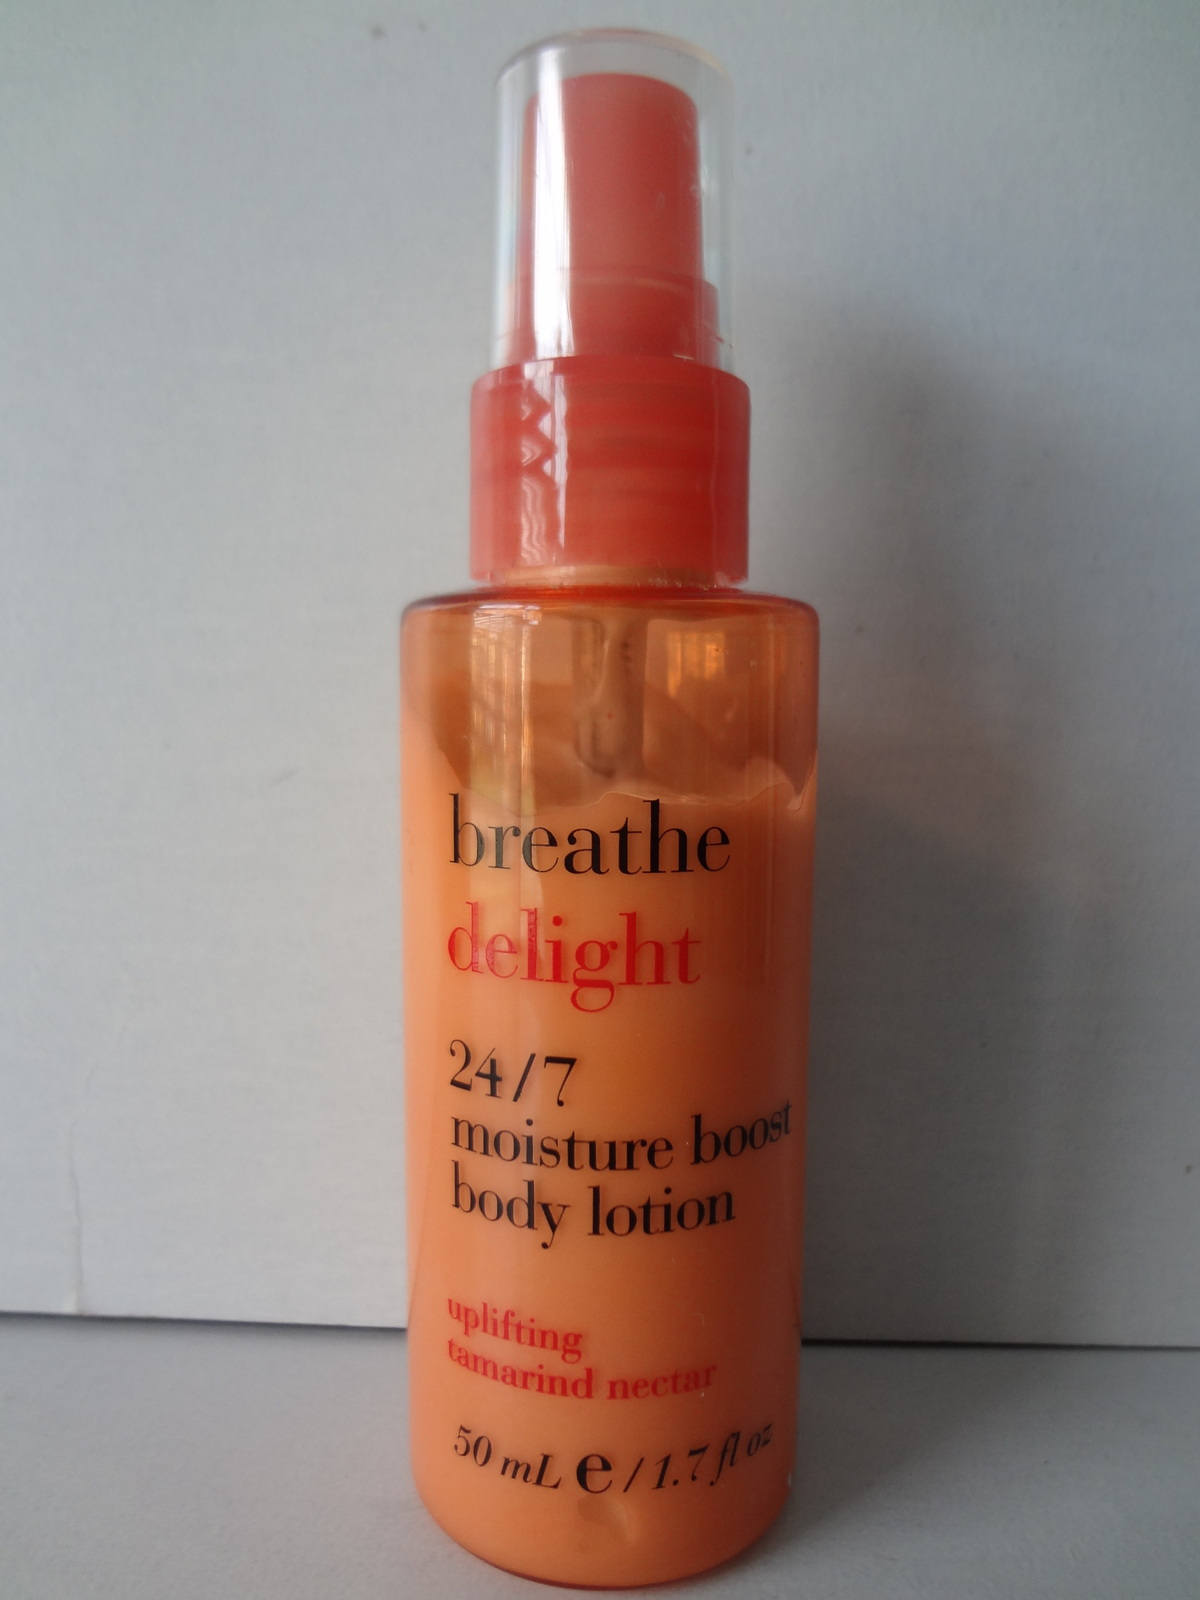 Bath & Body Works Breathe Delight Uplifting Tamarind Nectar Boost Body Lotion 1.